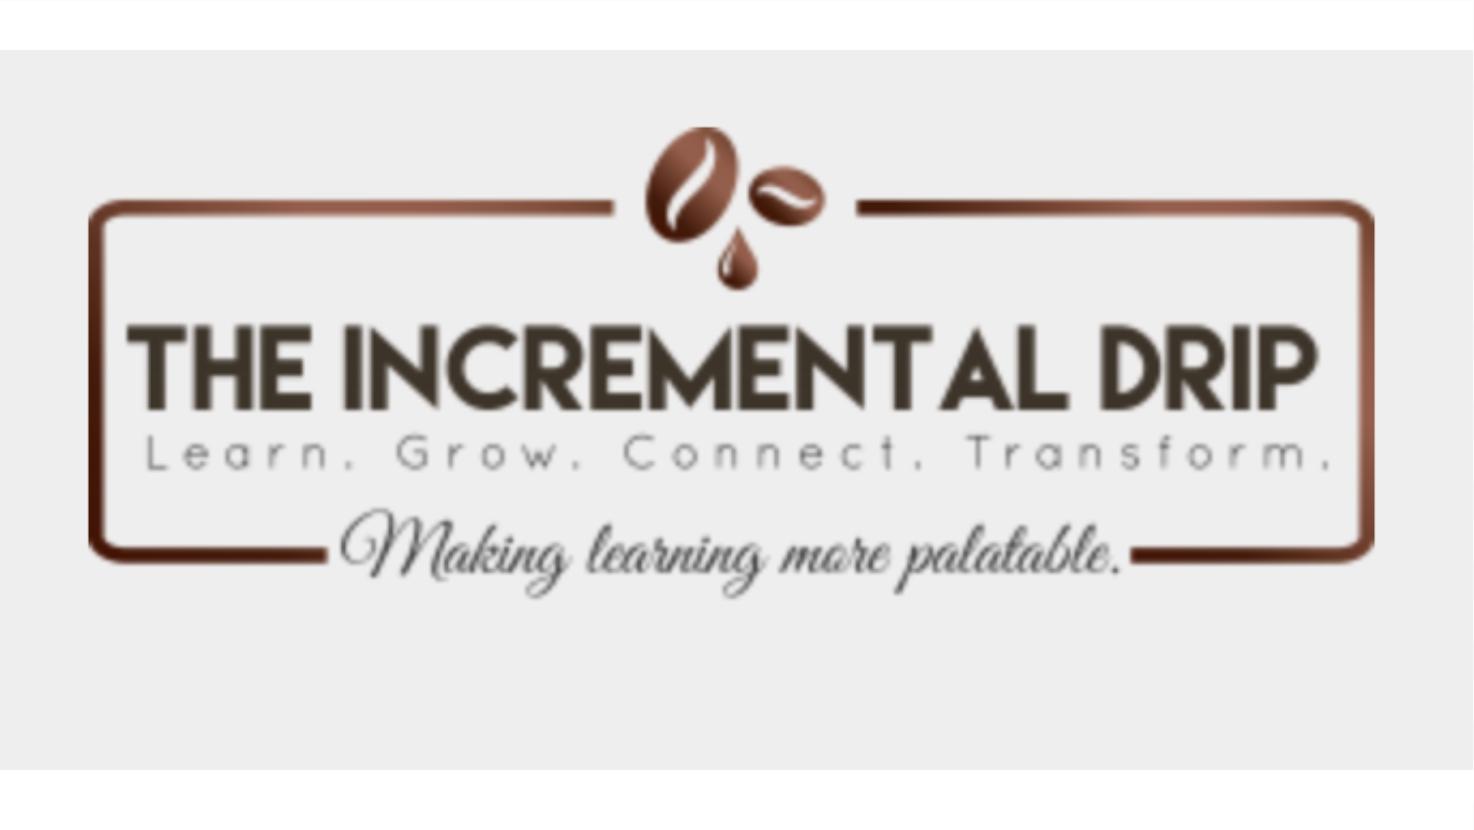 The Incremental Drip